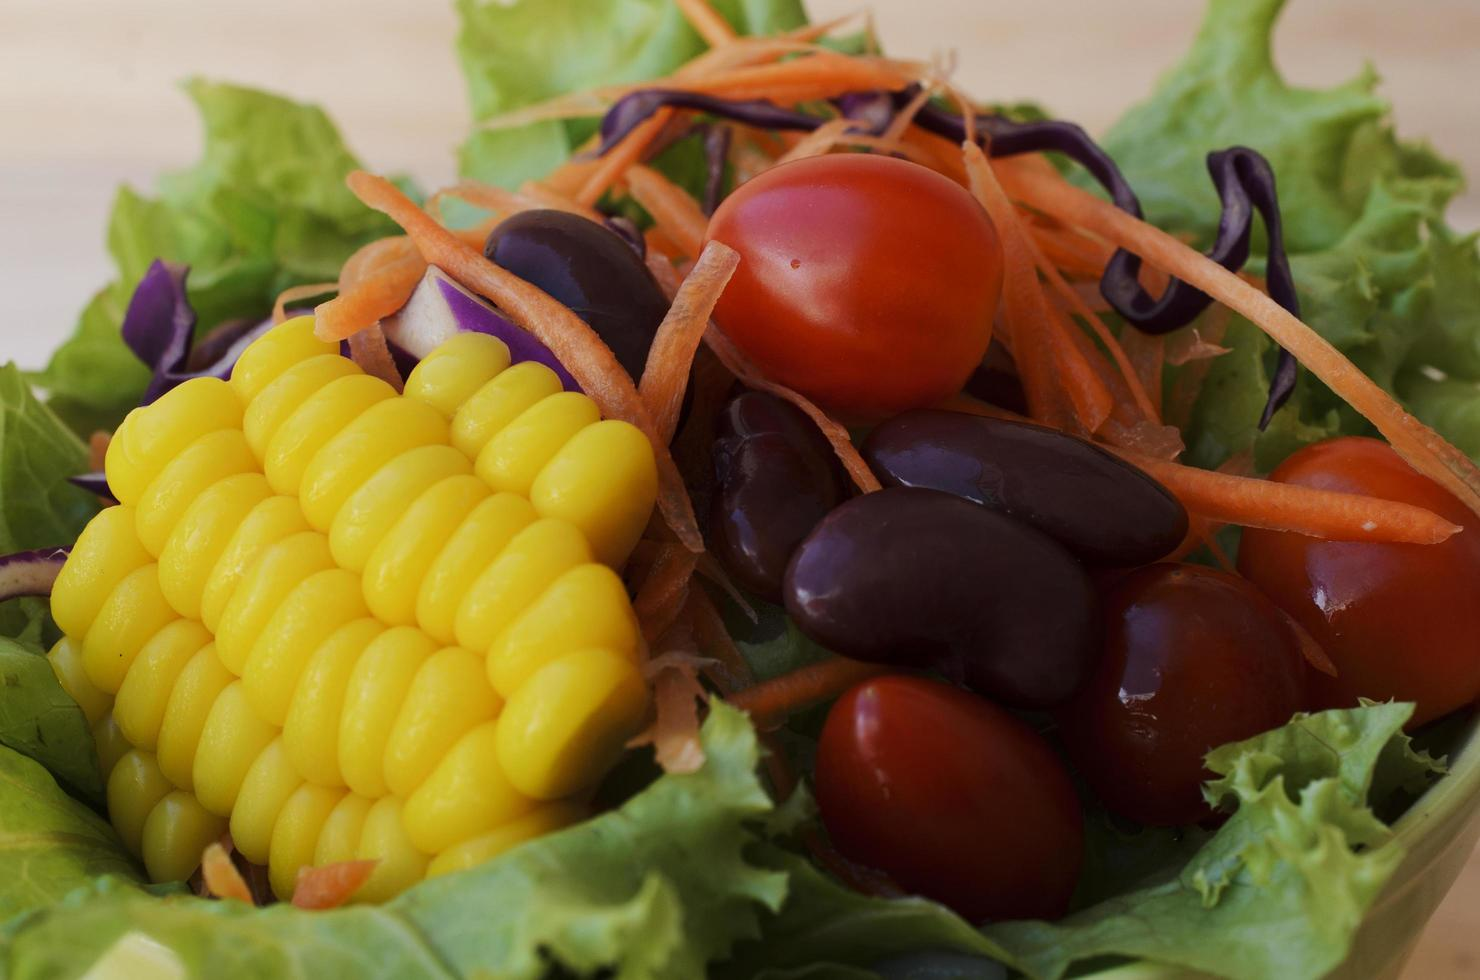 insalata di verdure fresche con macro close up per sfondi alimentari foto